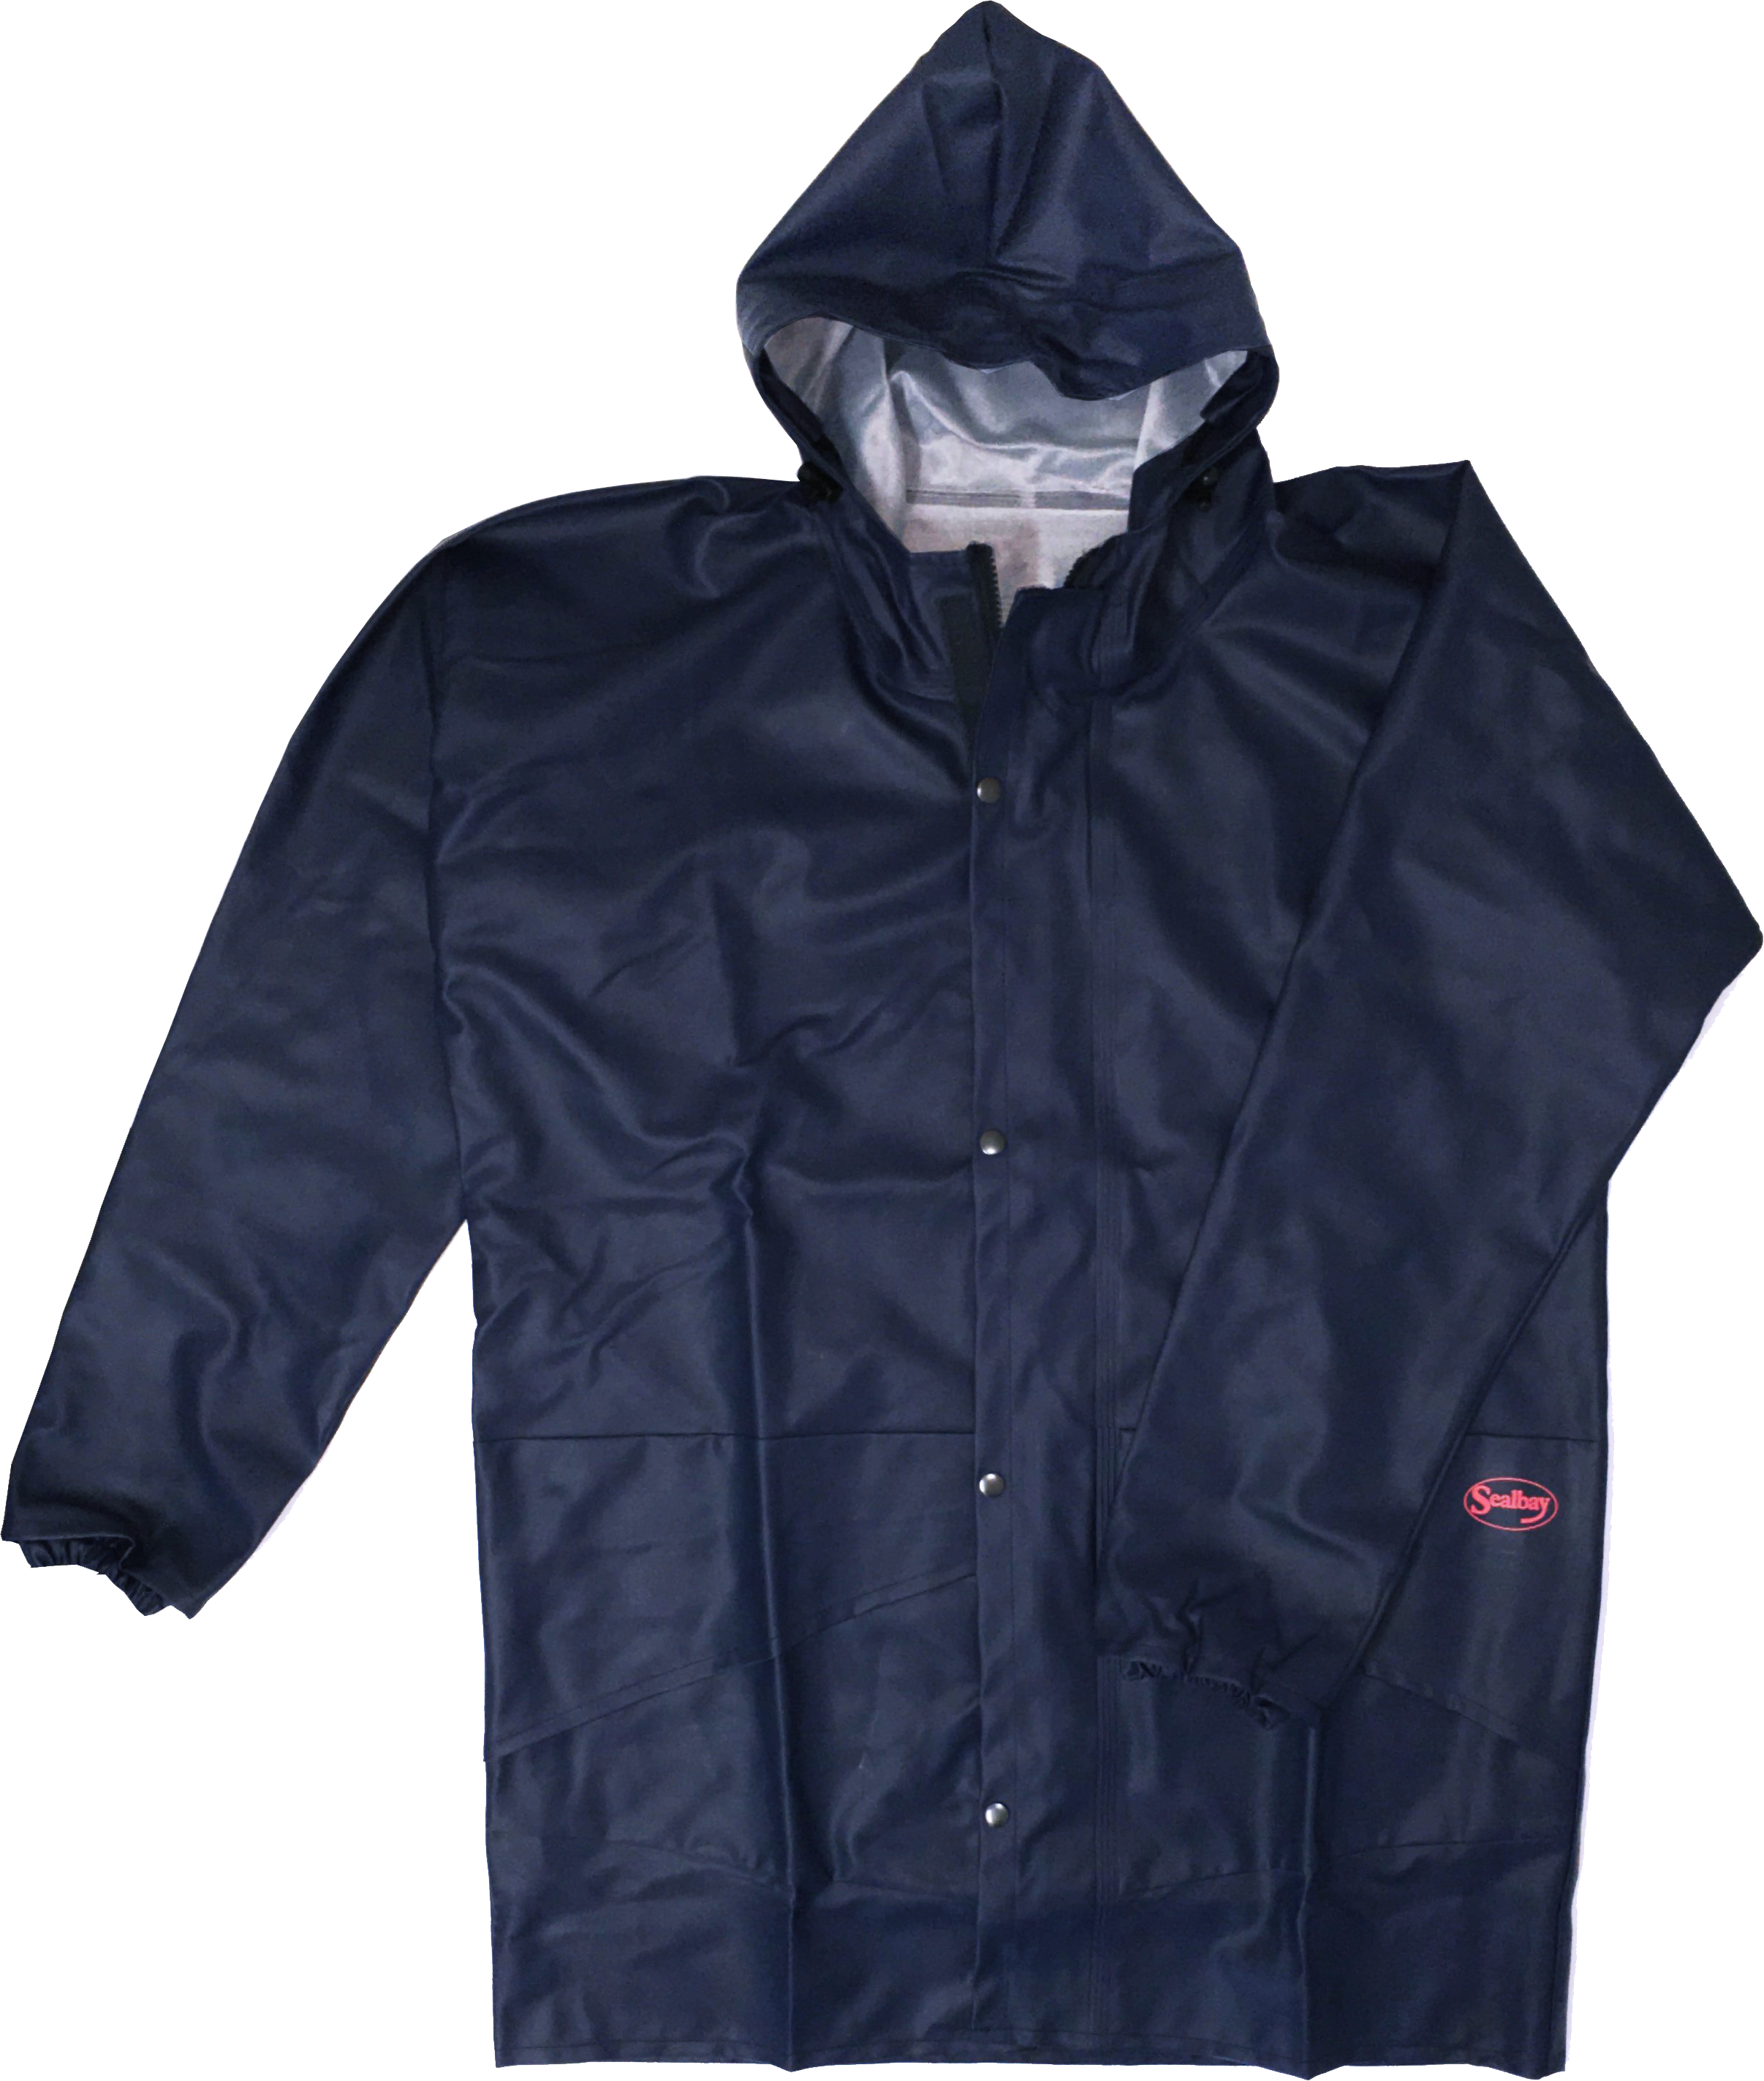 Seal bay rain parka. Jacket clipart waterproof jacket